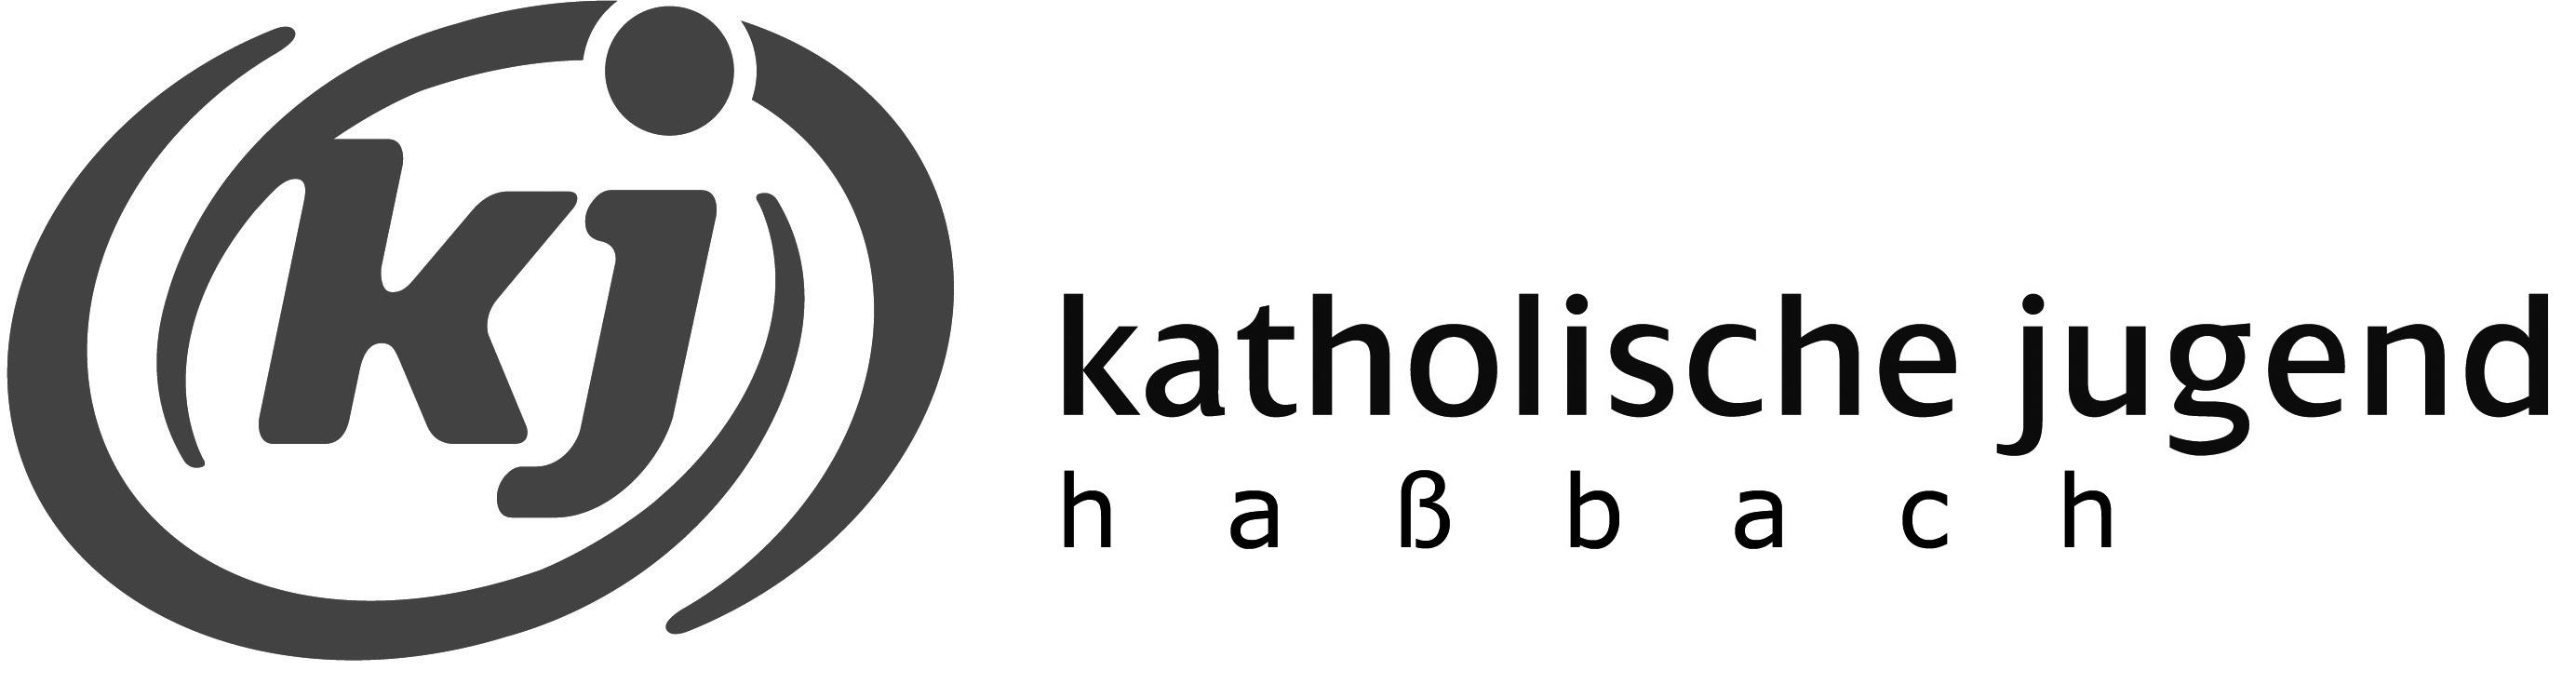 logo_kj_hassbach_breit_gray